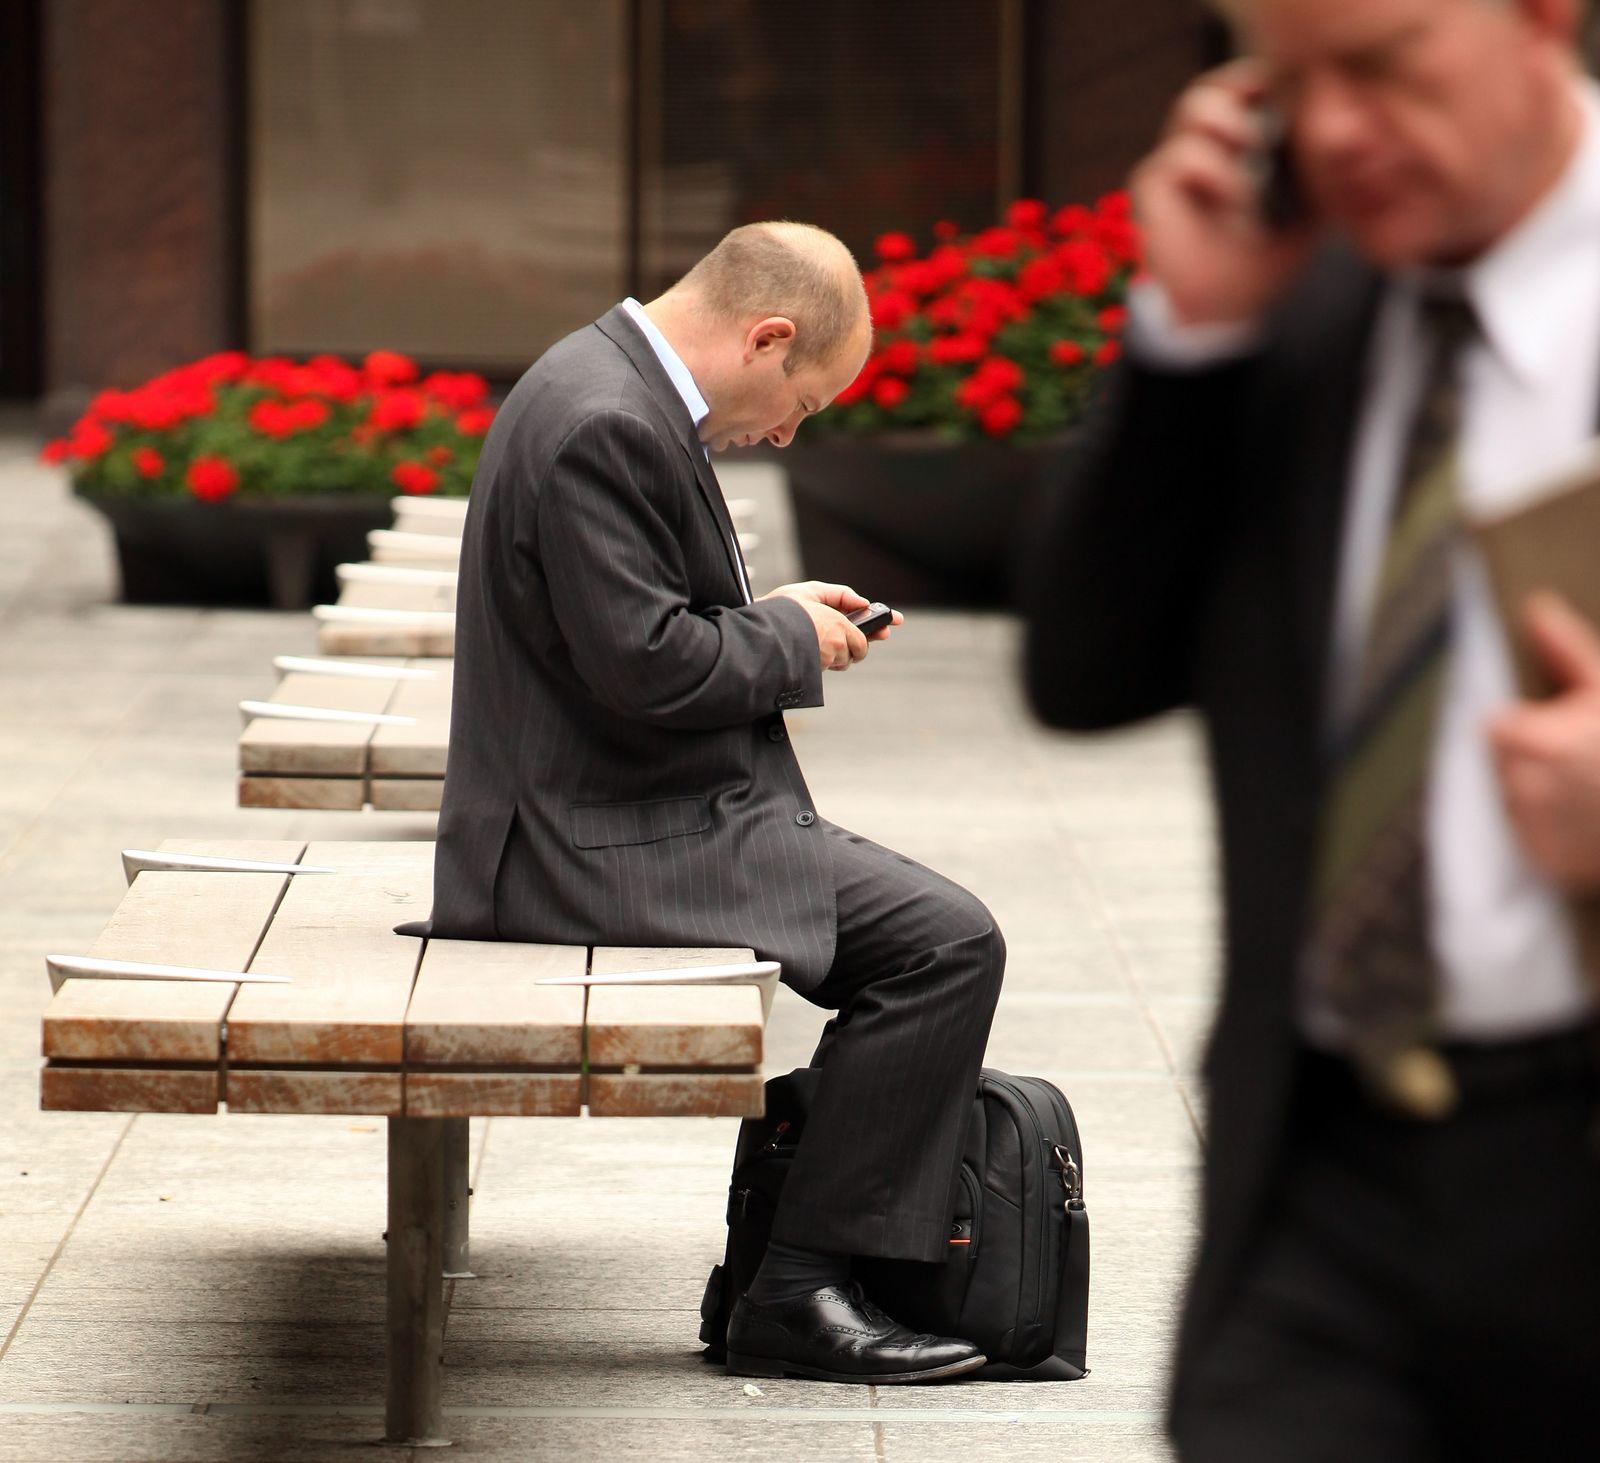 Symbolbild Berufsstress / Handy / Kommunikation